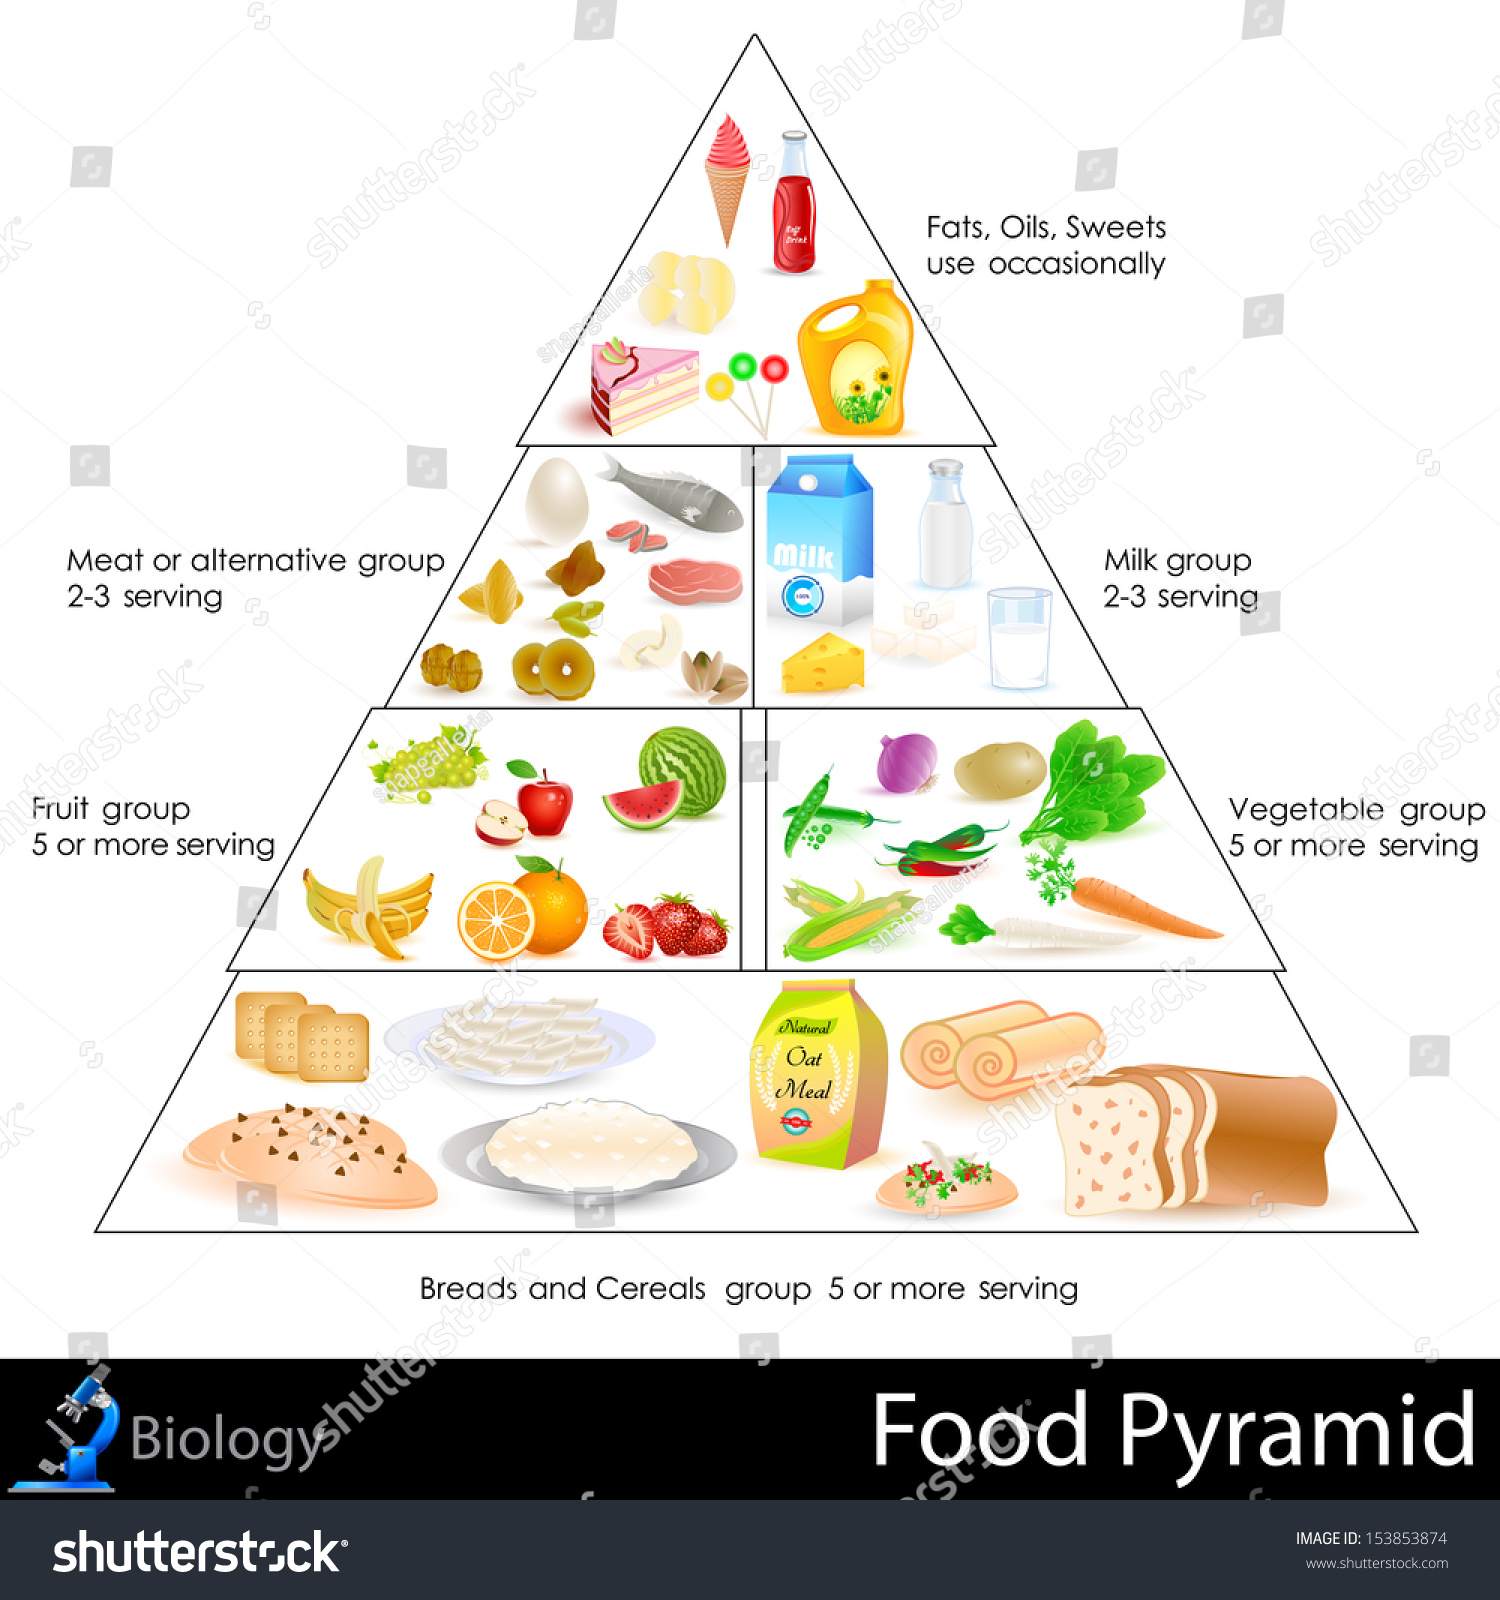 Food Pyramid Essay